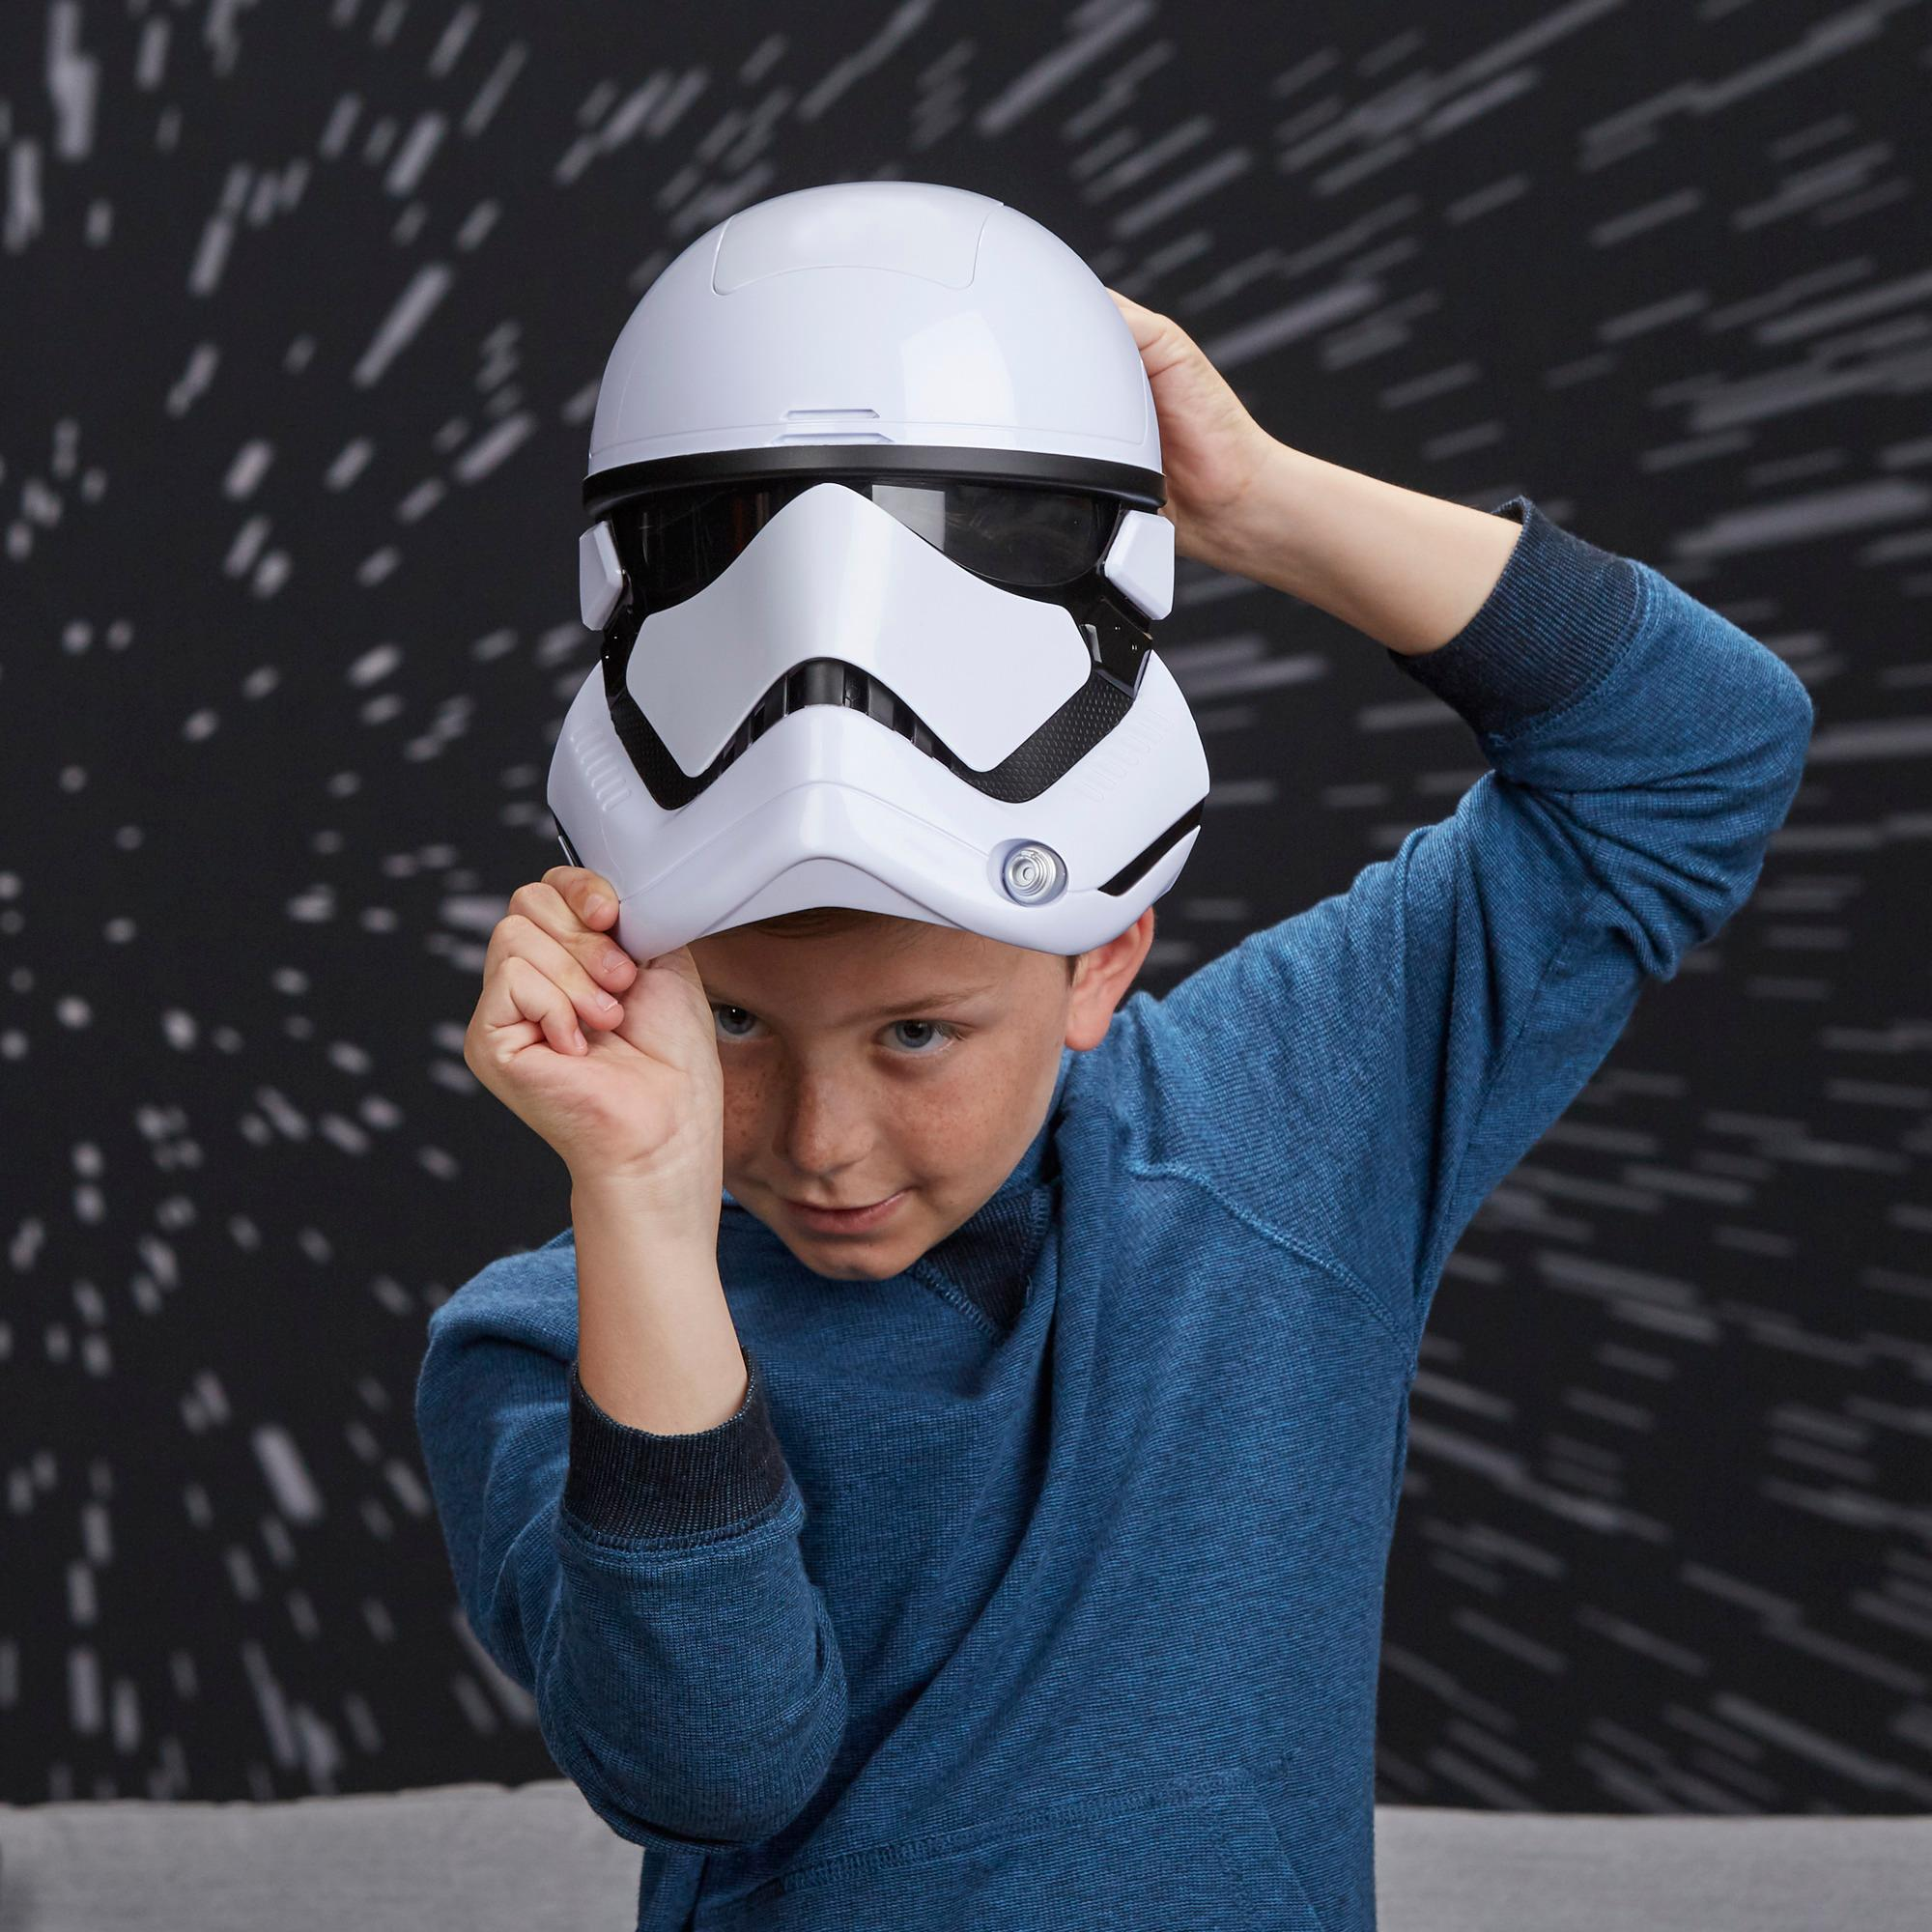 Star Wars: Os Últimos Jedi - Máscara Eletrônica de Stormtrooper da Primeira Ordem